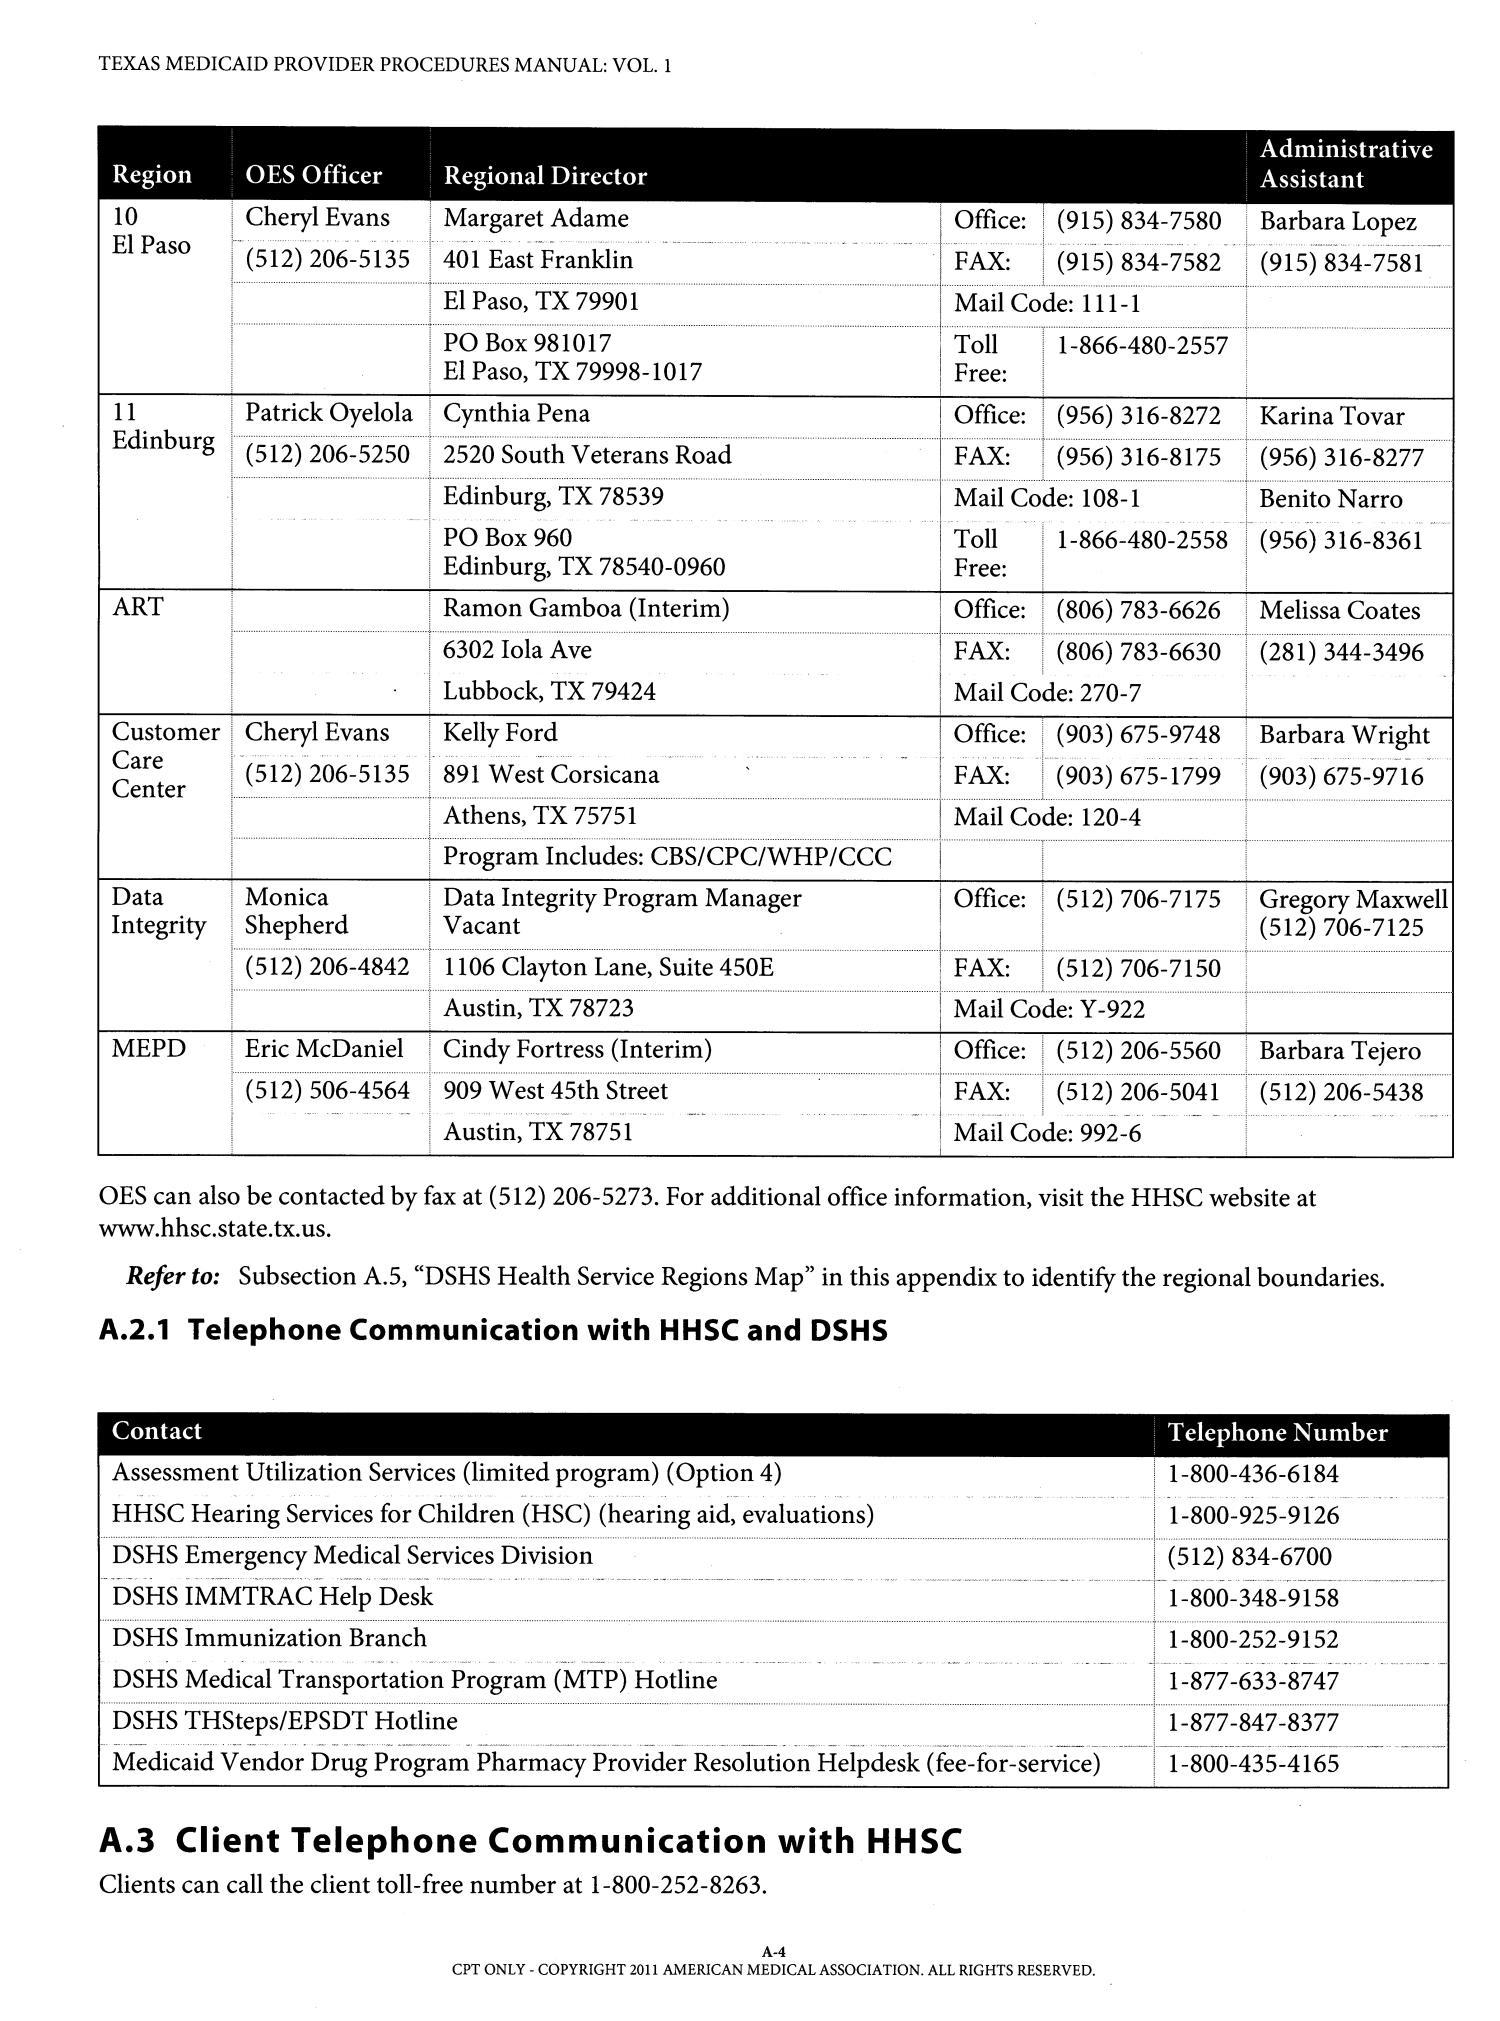 Michigan Medicaid Policy Update Manual Guide